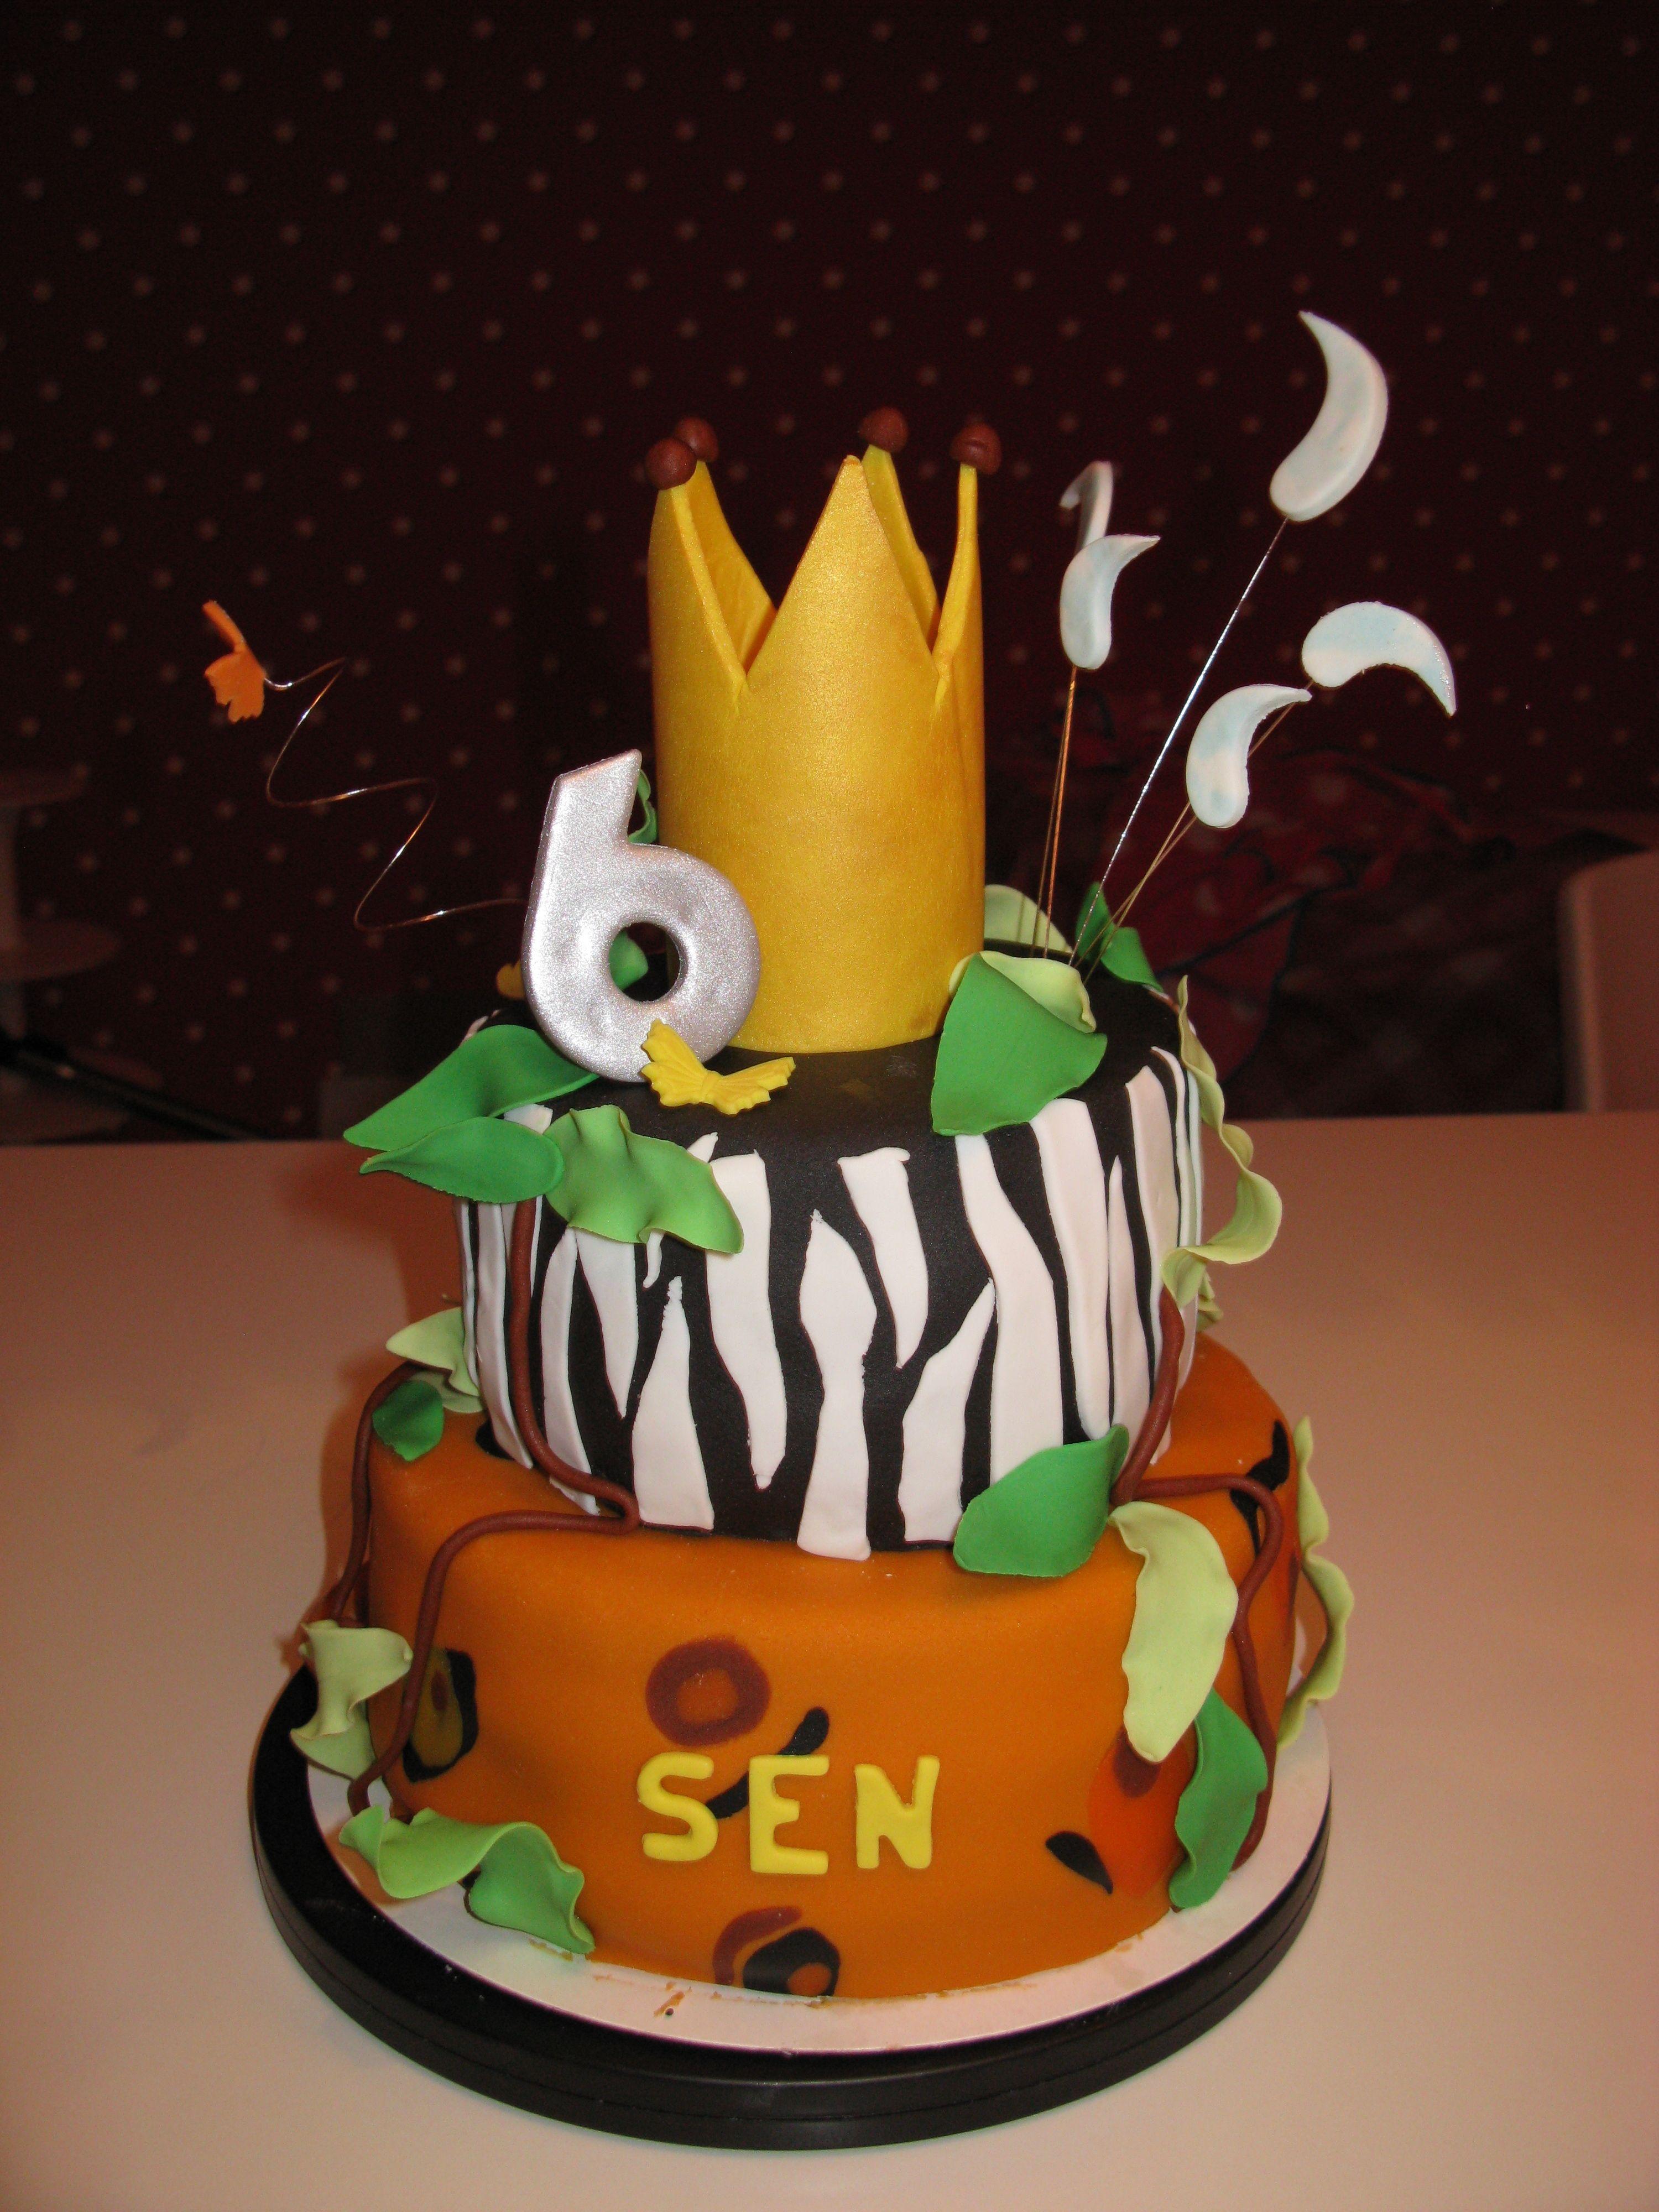 Images Of A King Birthday Cake : Lion king birthday cake Emma s birthday Pinterest